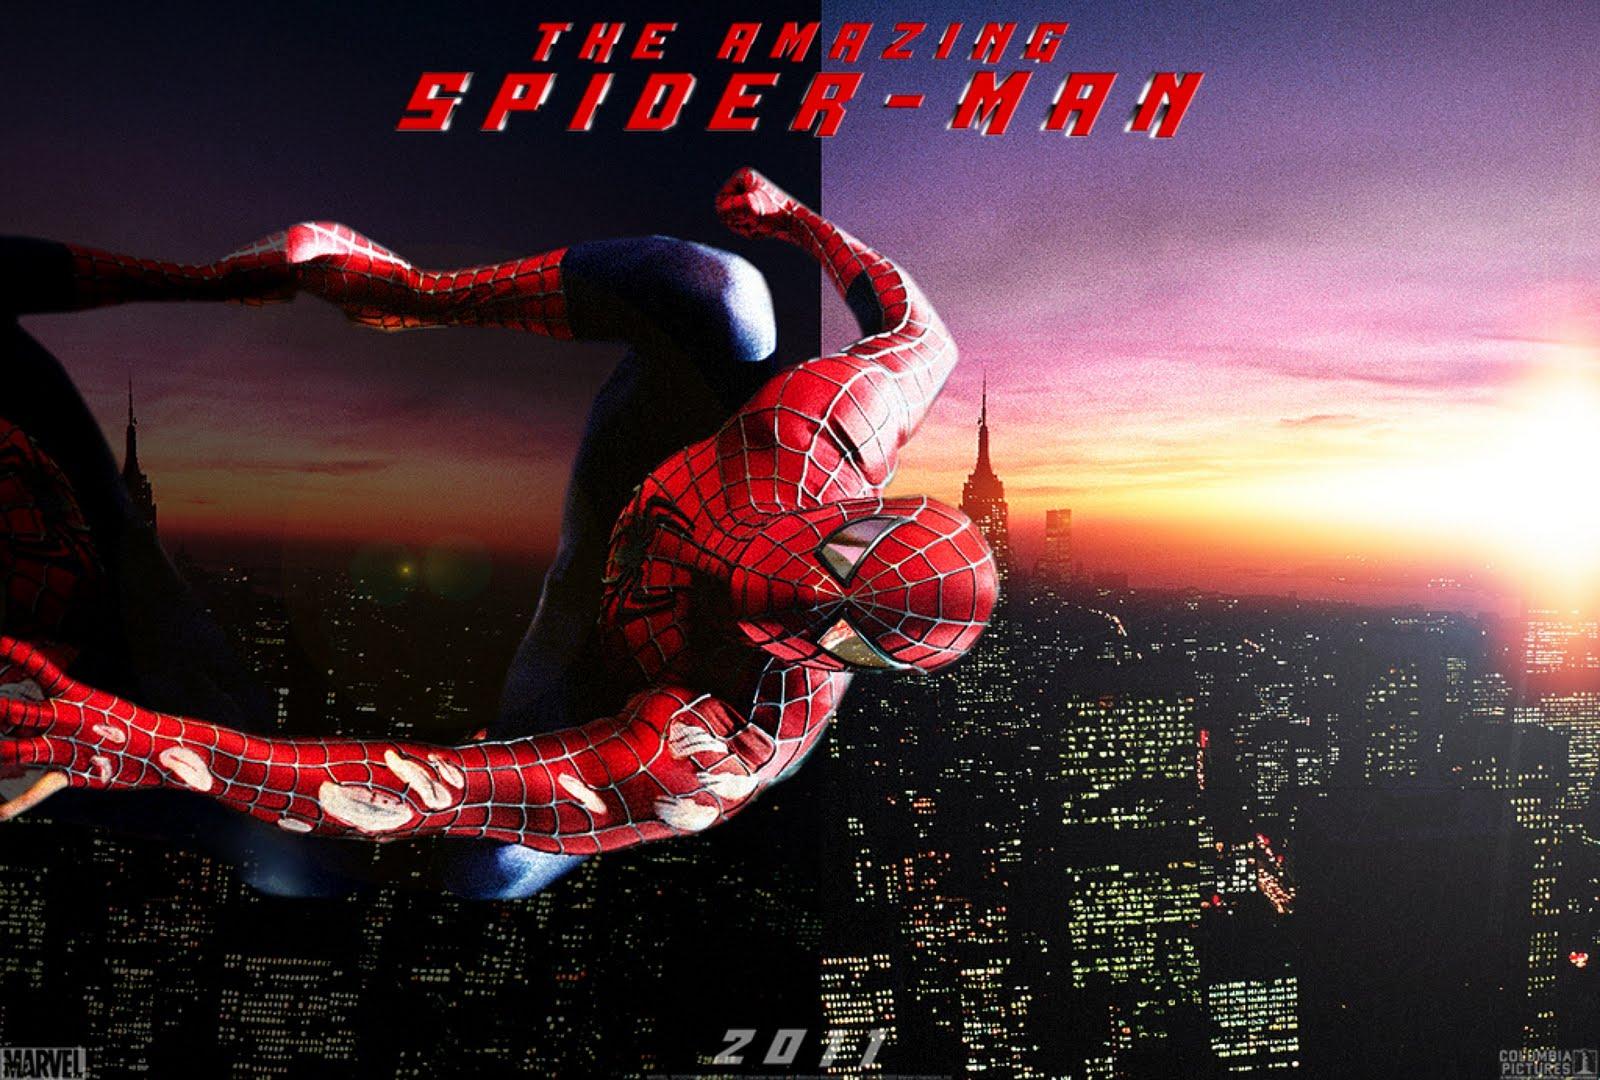 http://1.bp.blogspot.com/-8lIKegVSbwE/T_Mzc514joI/AAAAAAAADIU/Gh-Eepjg0HU/s1600/The+Amazing+Spider-Man+4+Wallpaper+01.jpg